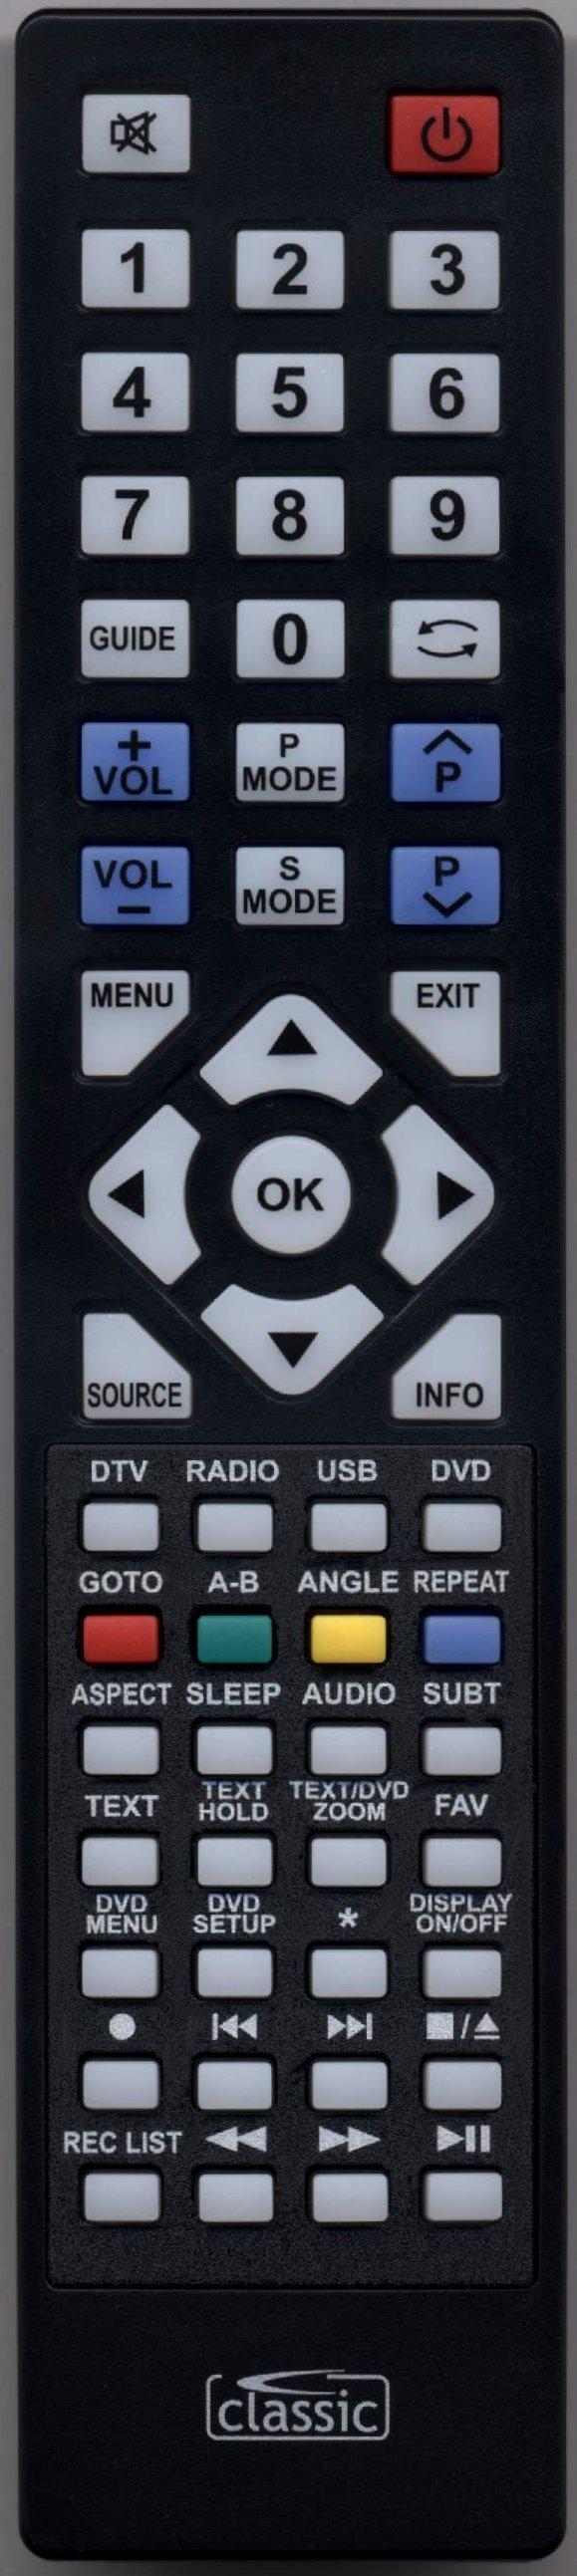 BLAUPUNKT 50/238Z-GB-5B2-FGKUP Remote Control Alternative